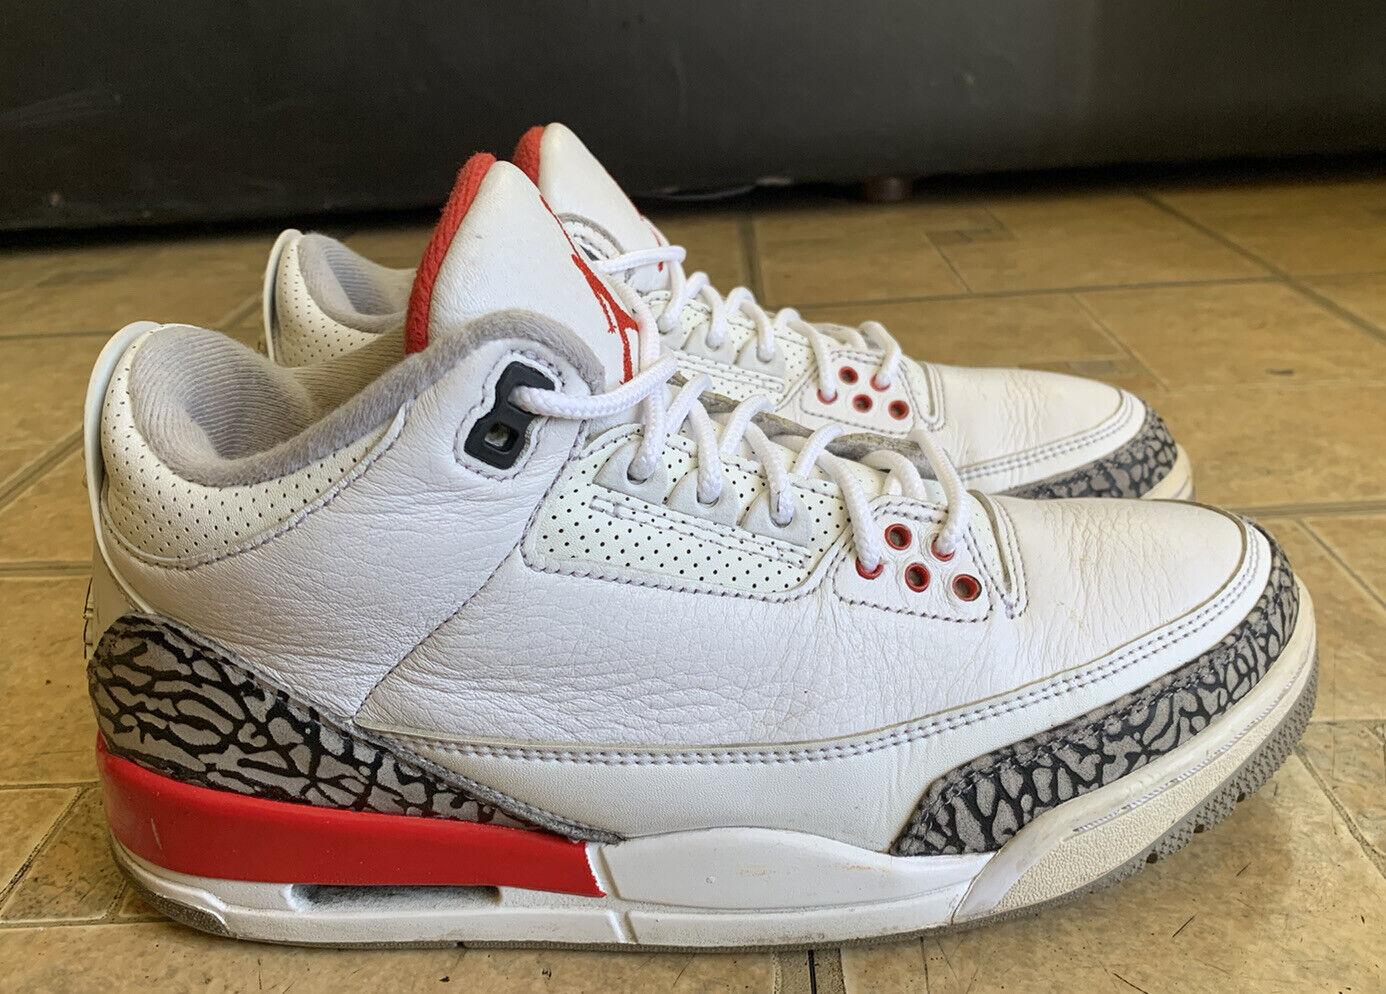 Air Jordan 3 Retro Katrina Big Kids